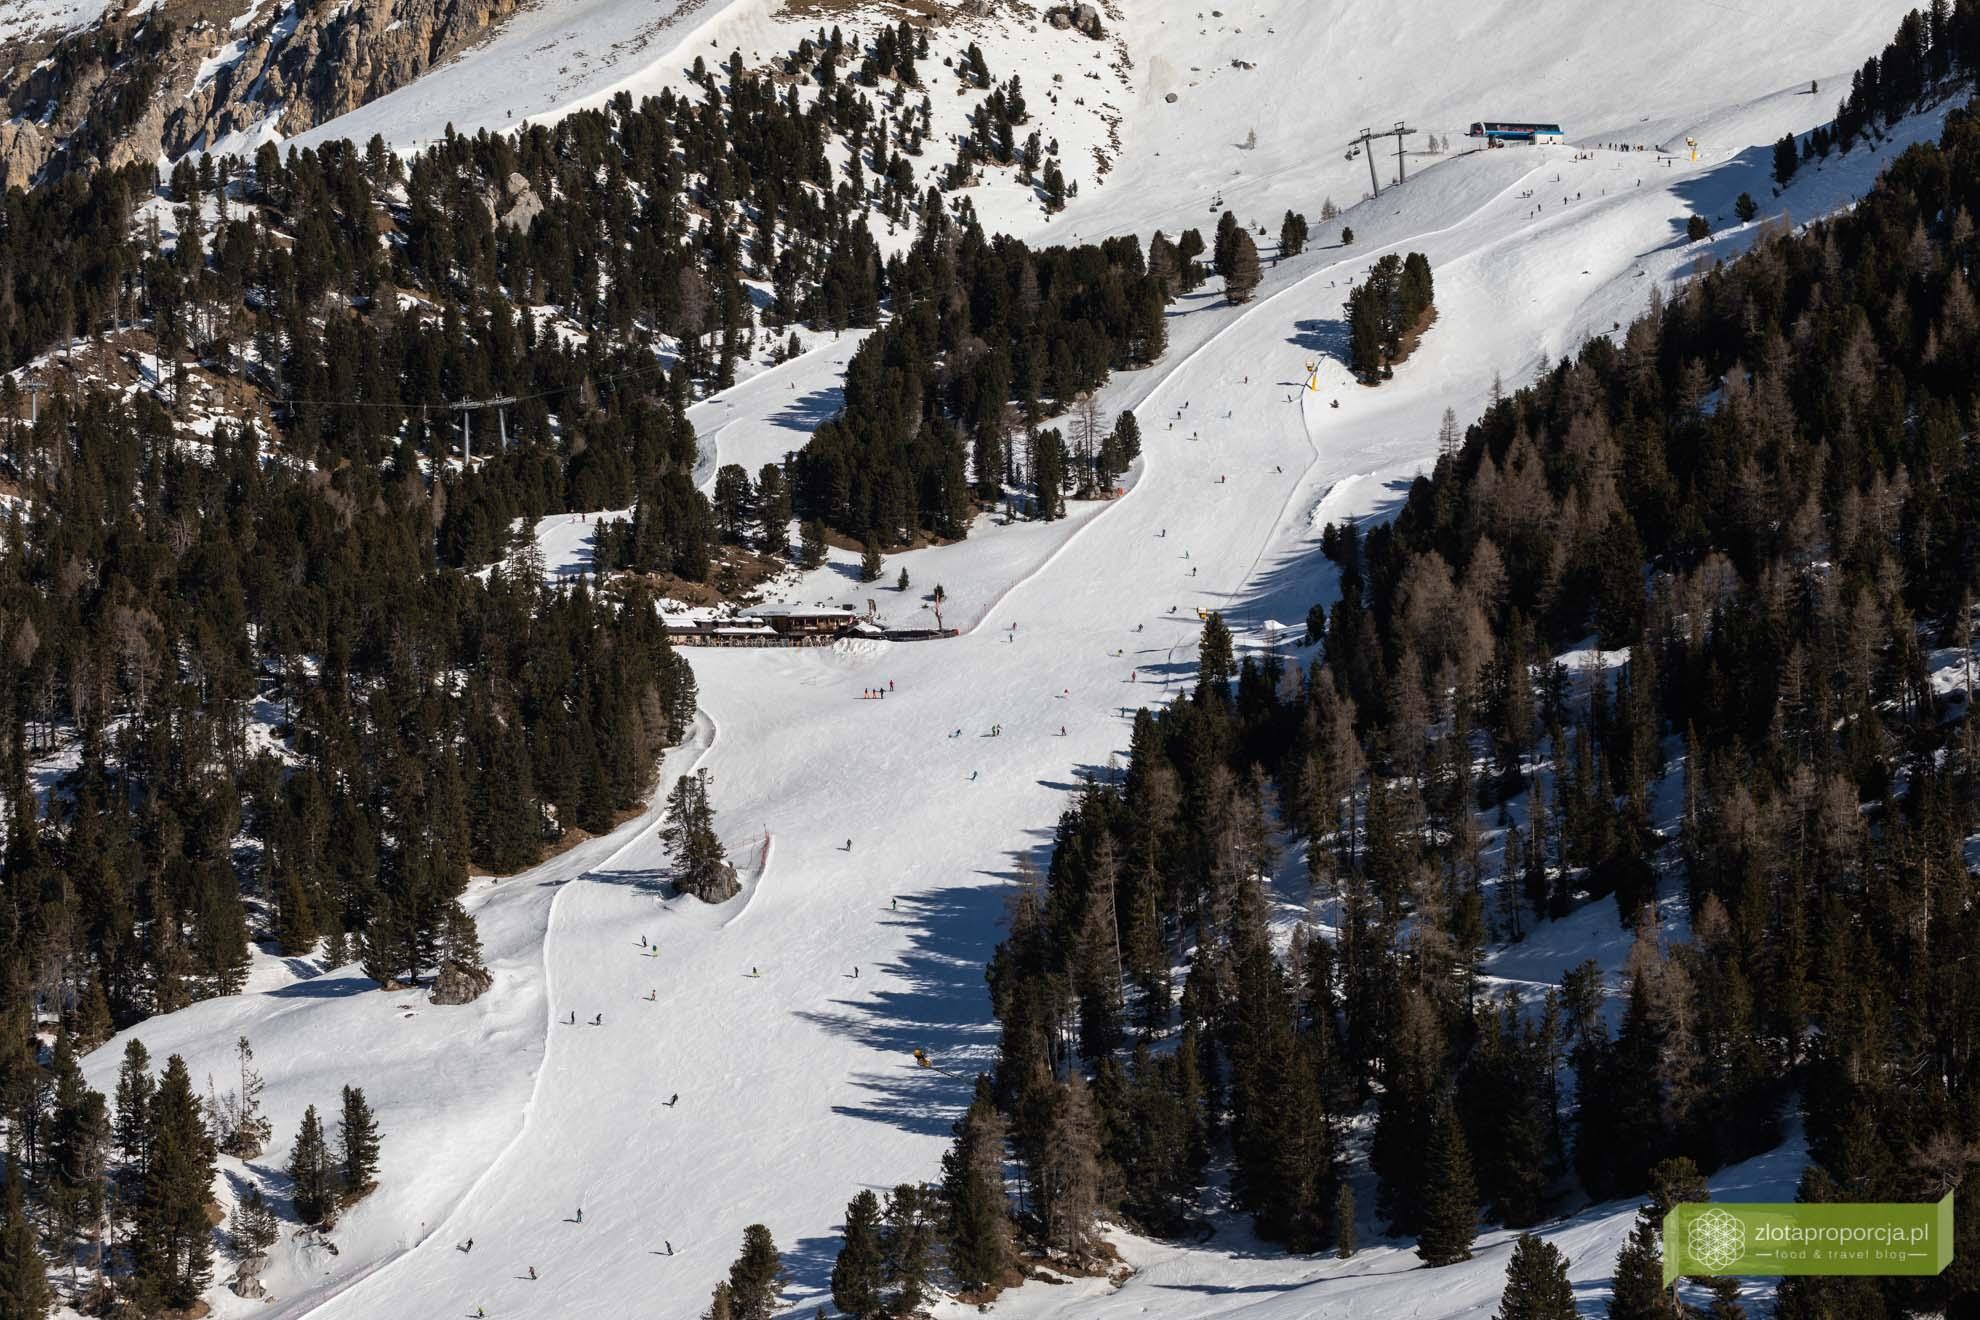 PołudniPołudniowy Tyrol; Val d'Ega; Eggental; Dolomity; narty Południowy Tyrol; Obereggen; Ski Center Obereggen; ośrodek narciarski Obereegen; narty Obereggen; Oberegen narty; Obereggen ski; owy Tyrol; Val d'Ega; Eggental; Dolomity; narty Południowy Tyrol; Obereggen; Ski Center Obereggen; ośrodek narciarski Obereegen; narty Obereggen; Oberegen narty; Obereggen ski;